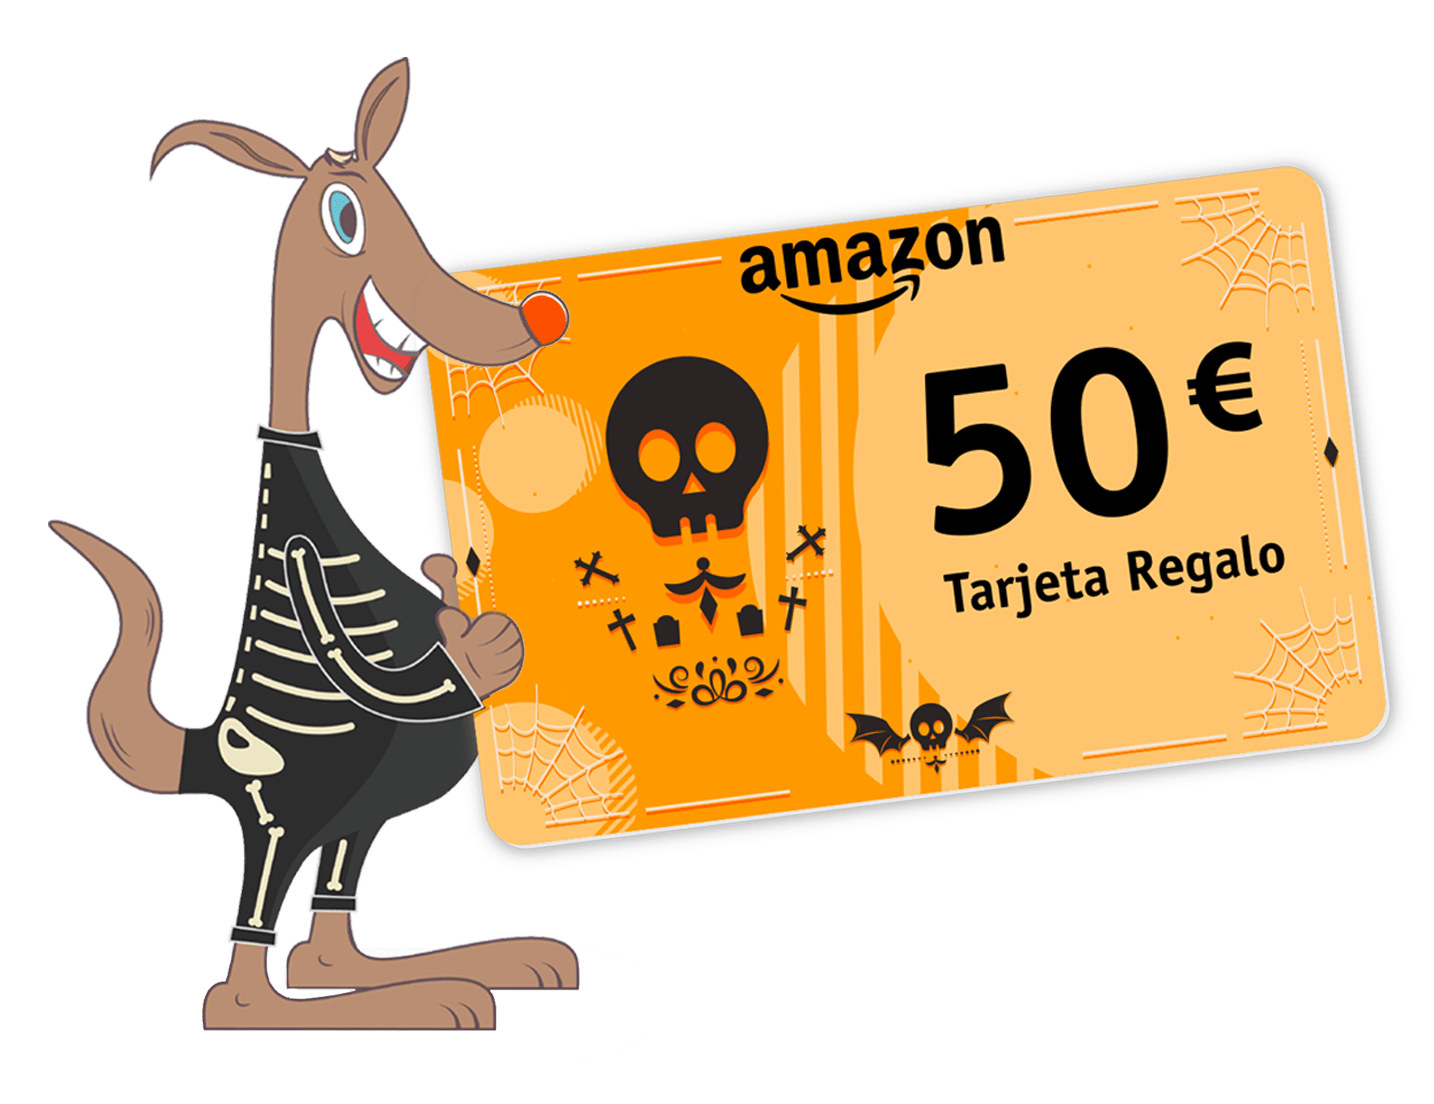 Tarjeta Regalo Amazon Gualu